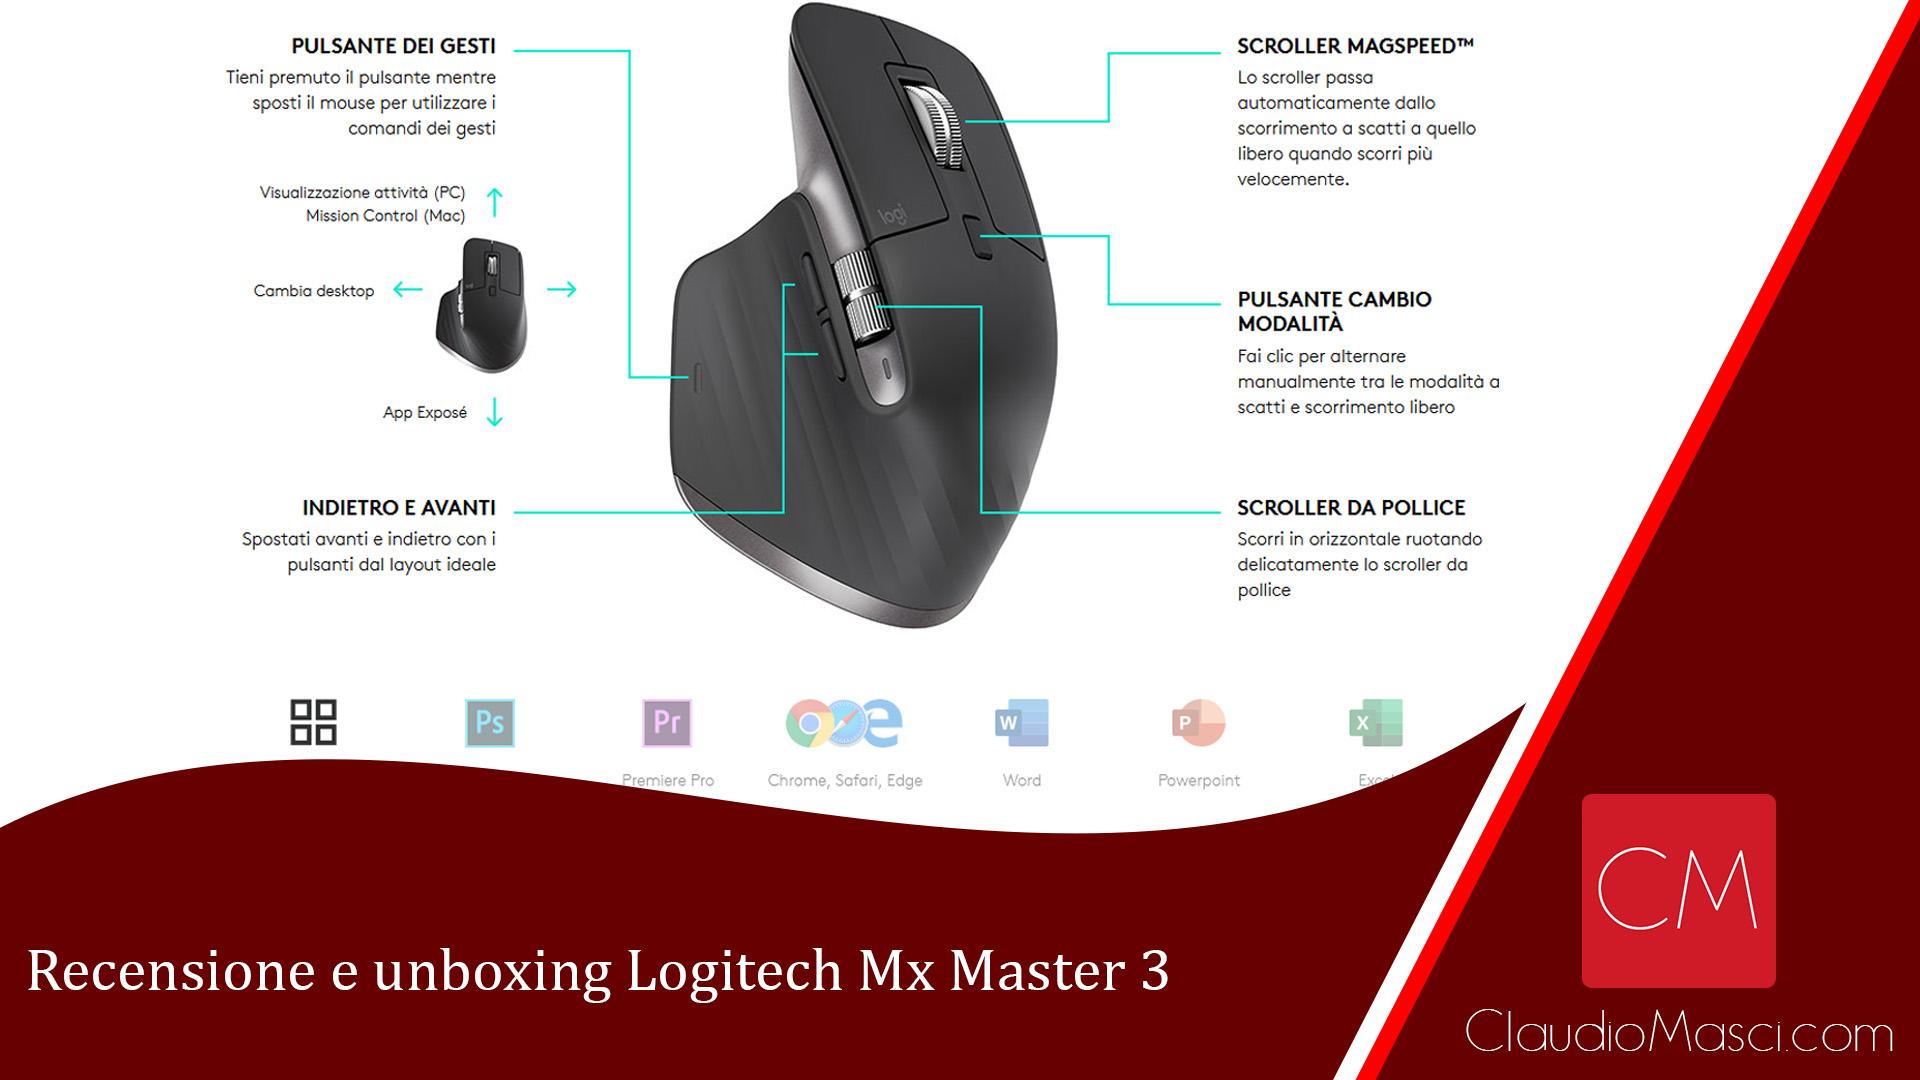 Recensione e Unboxing Logitech Mx Master 3